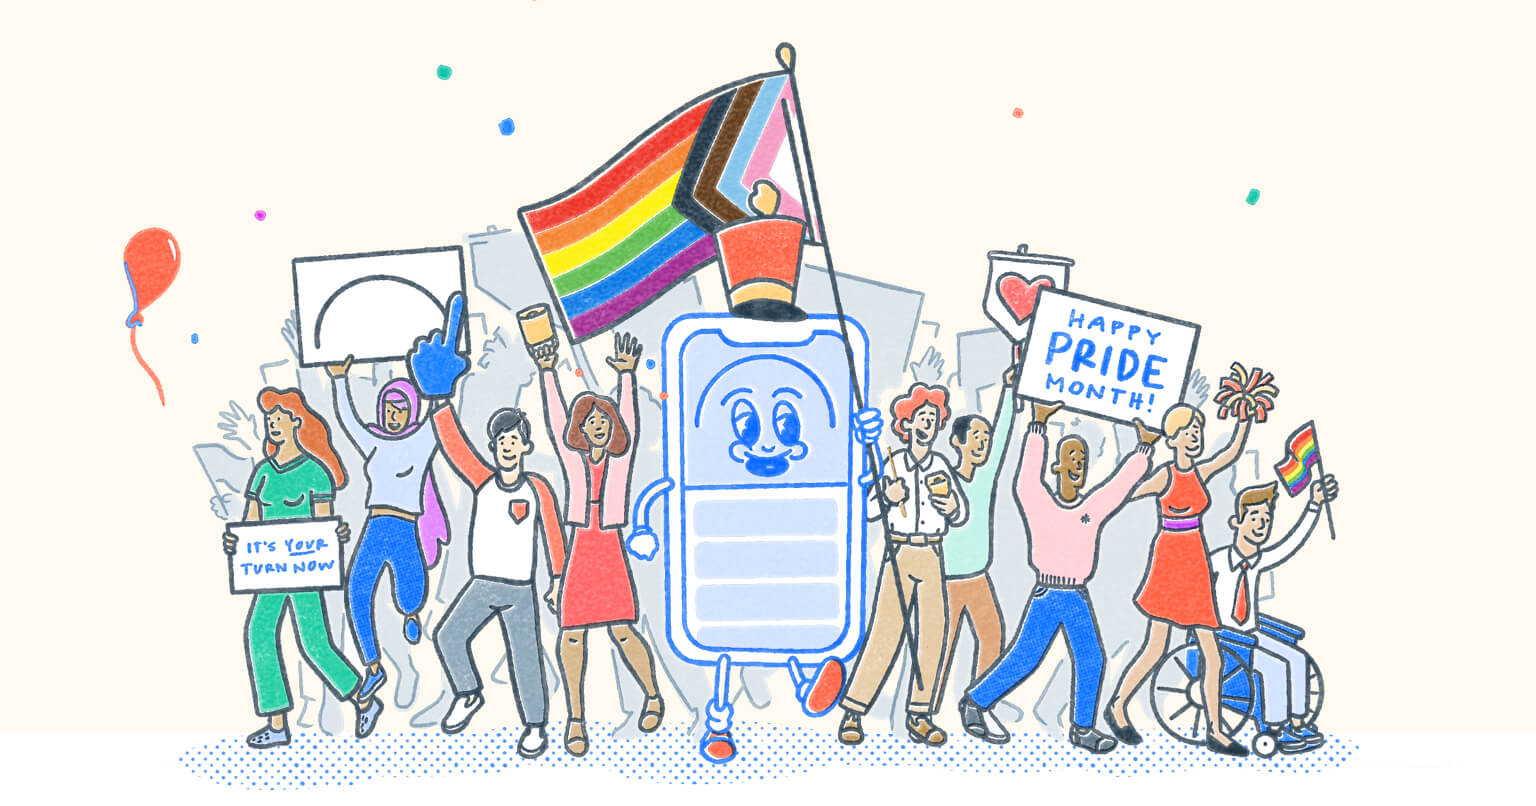 Pocket Prep parade celebrating Pride Month.